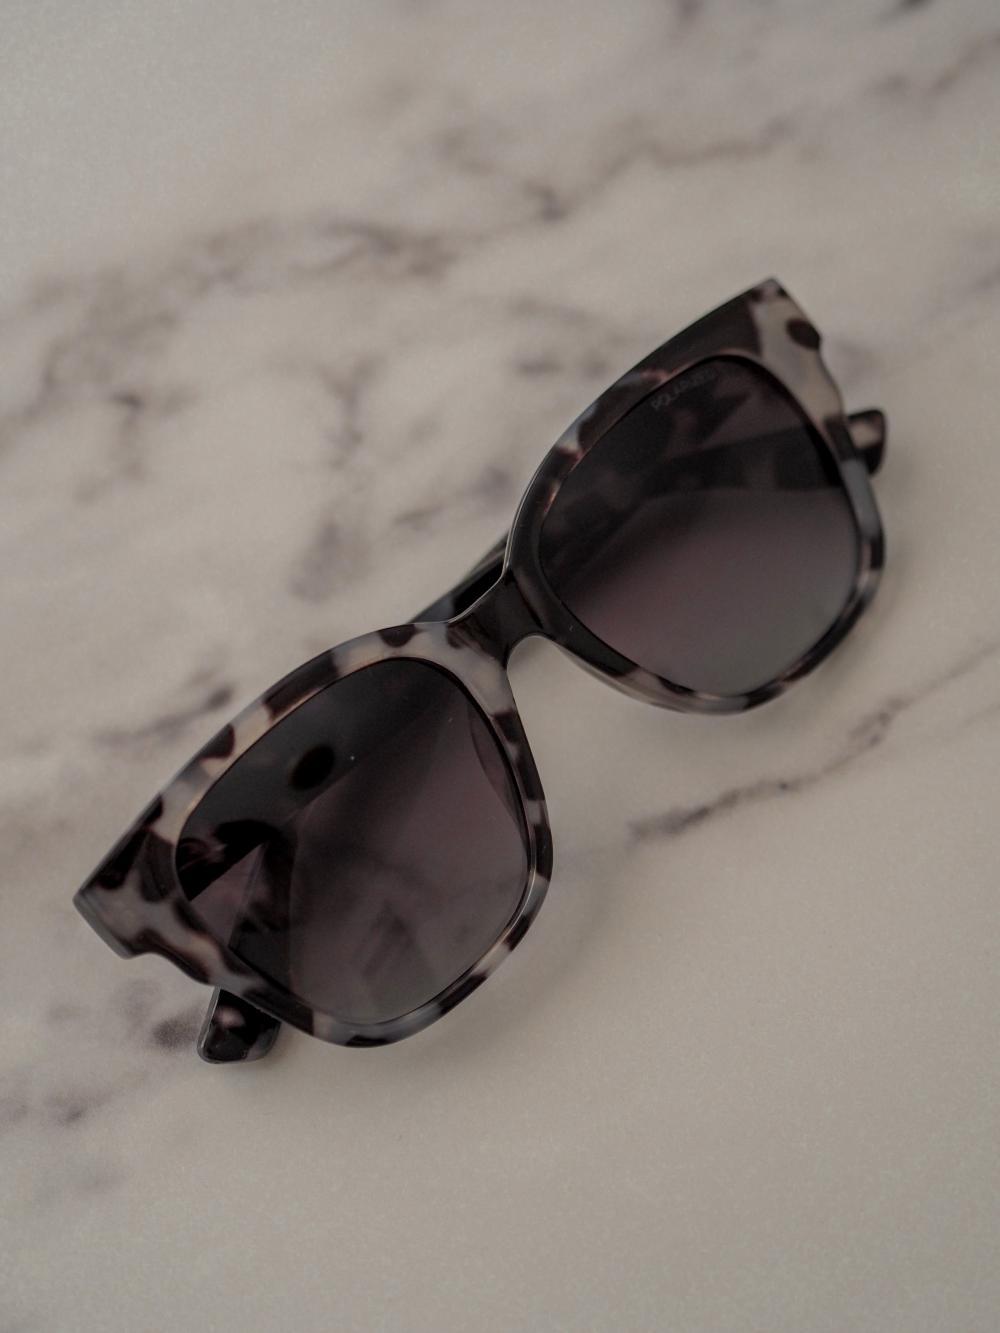 POLARIZED SUNGLASSES MODEL NICOLE | Glasses, watches, jewellery and accessories | Glasses | Img 1 | Tabdevi.com